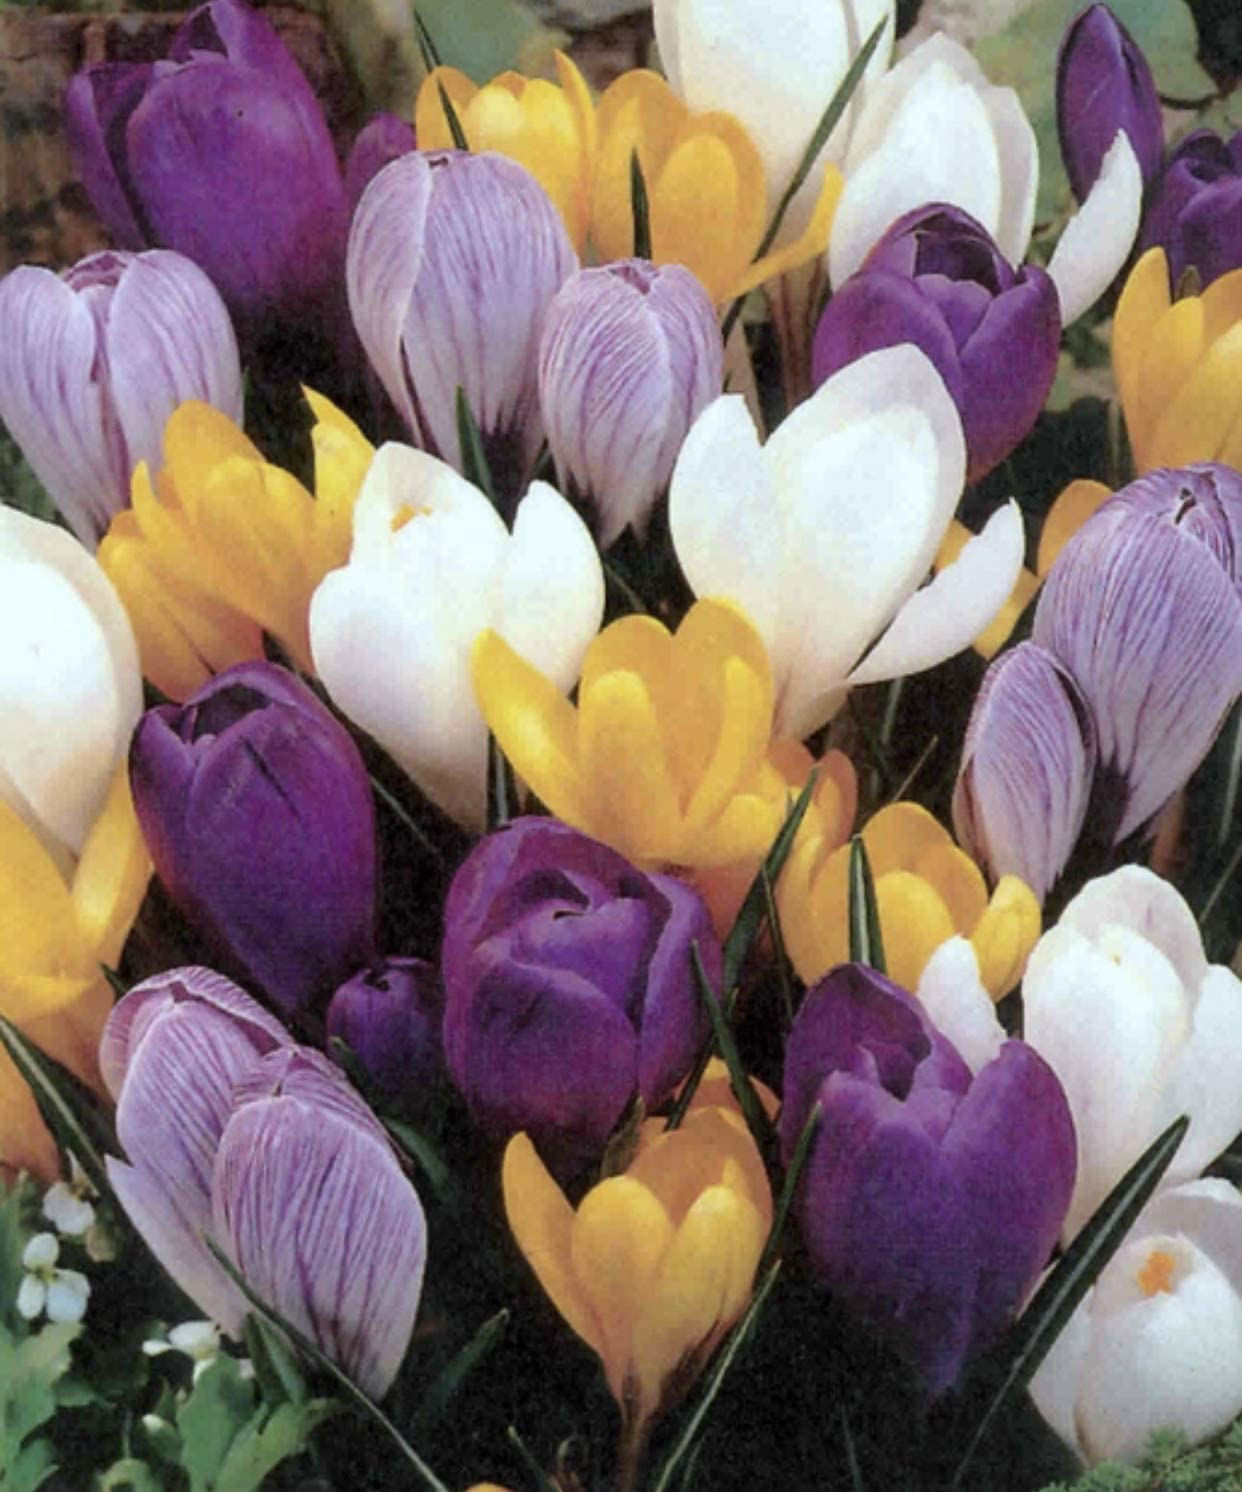 100 Mixed Colour Crocus Plants in The Green 100 Bulbs